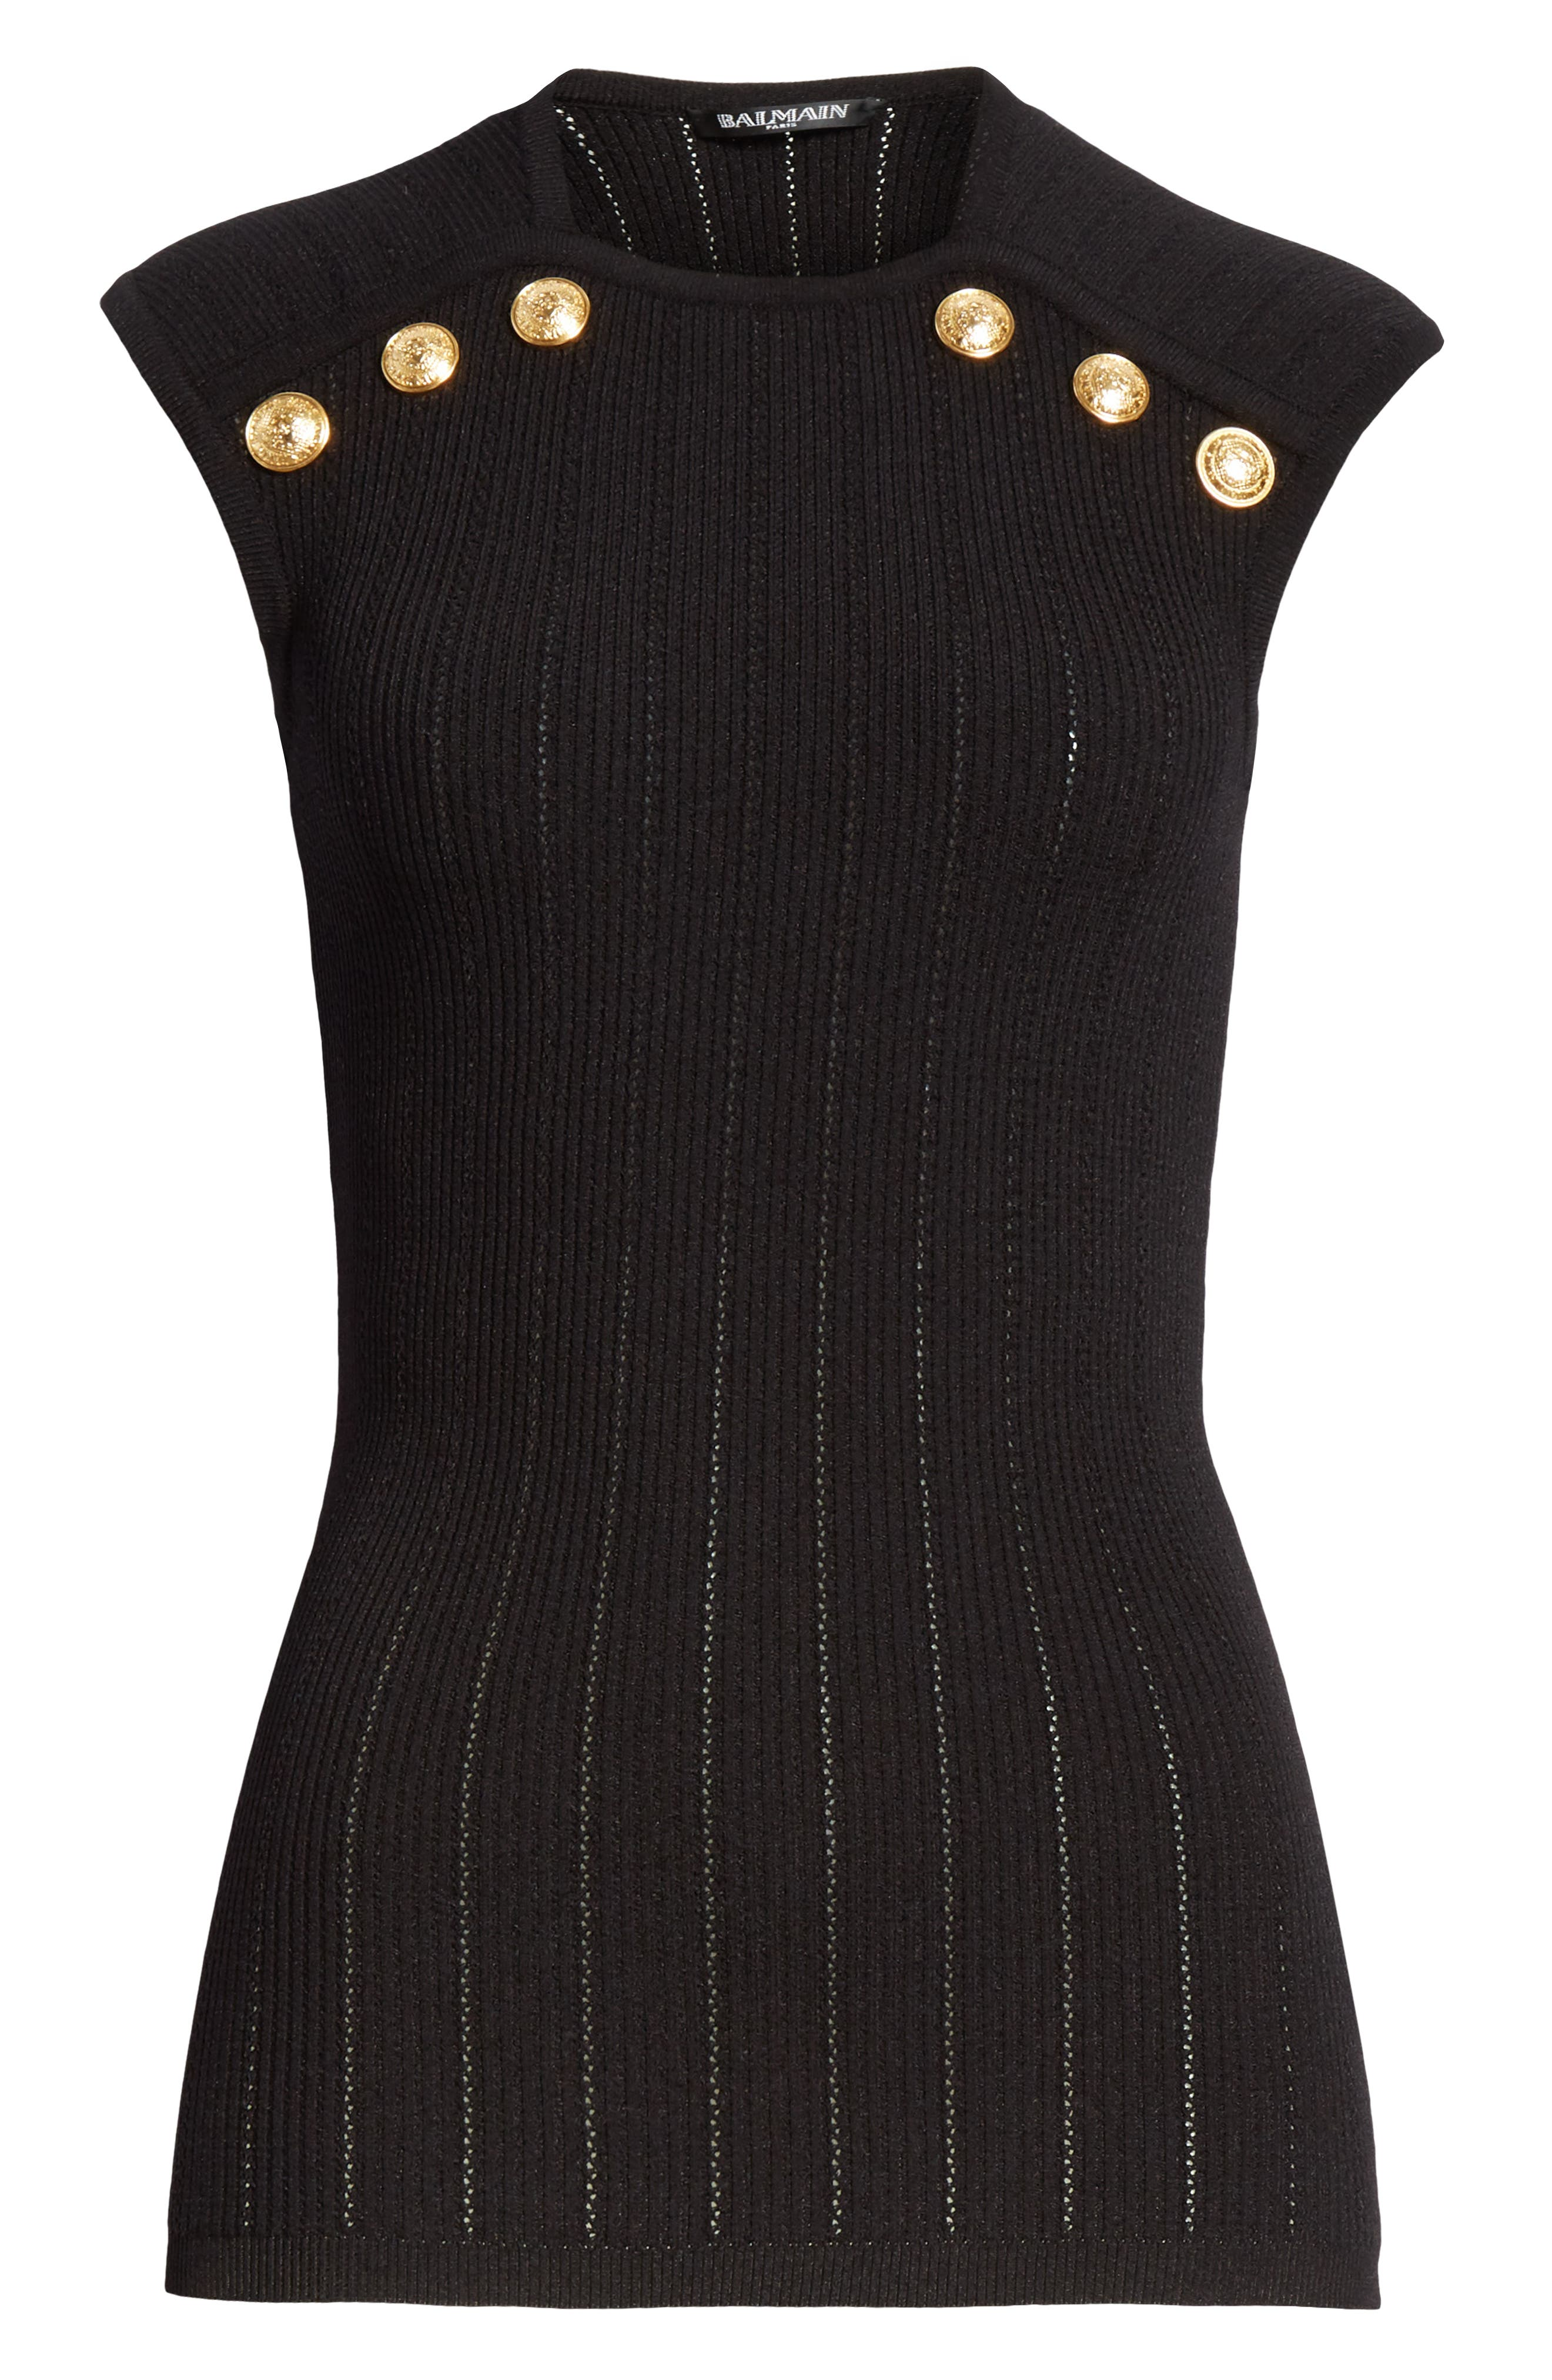 BALMAIN,                             Shoulder Button Rib Knit Top,                             Alternate thumbnail 6, color,                             0PA NOIR